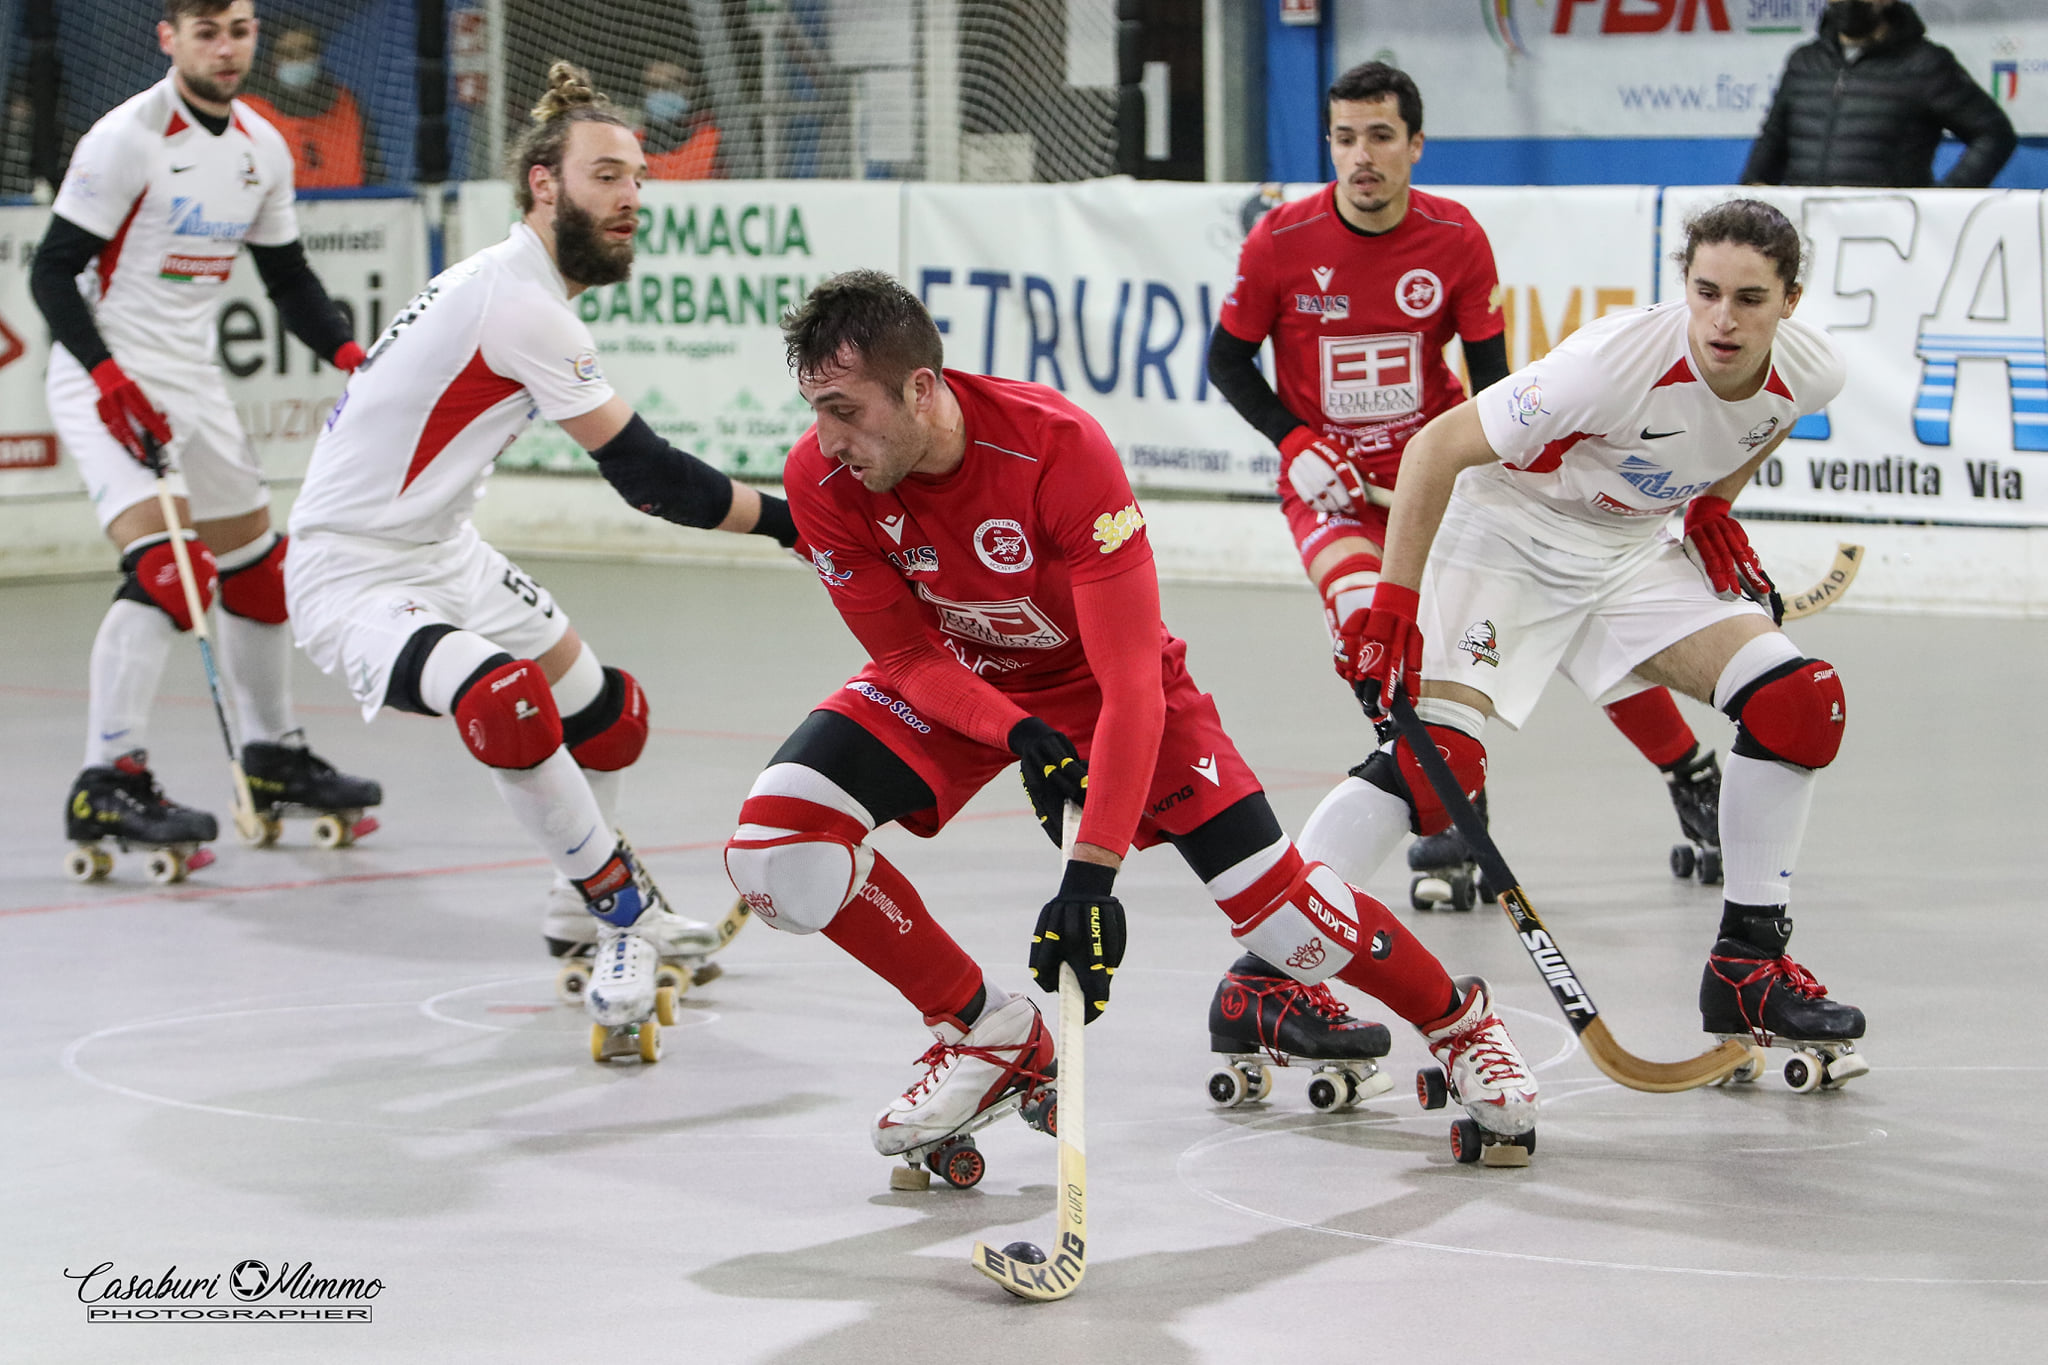 hockey-pista-circolo-pattinatori-grosseto-Edilfox-Breganze-Paghi.